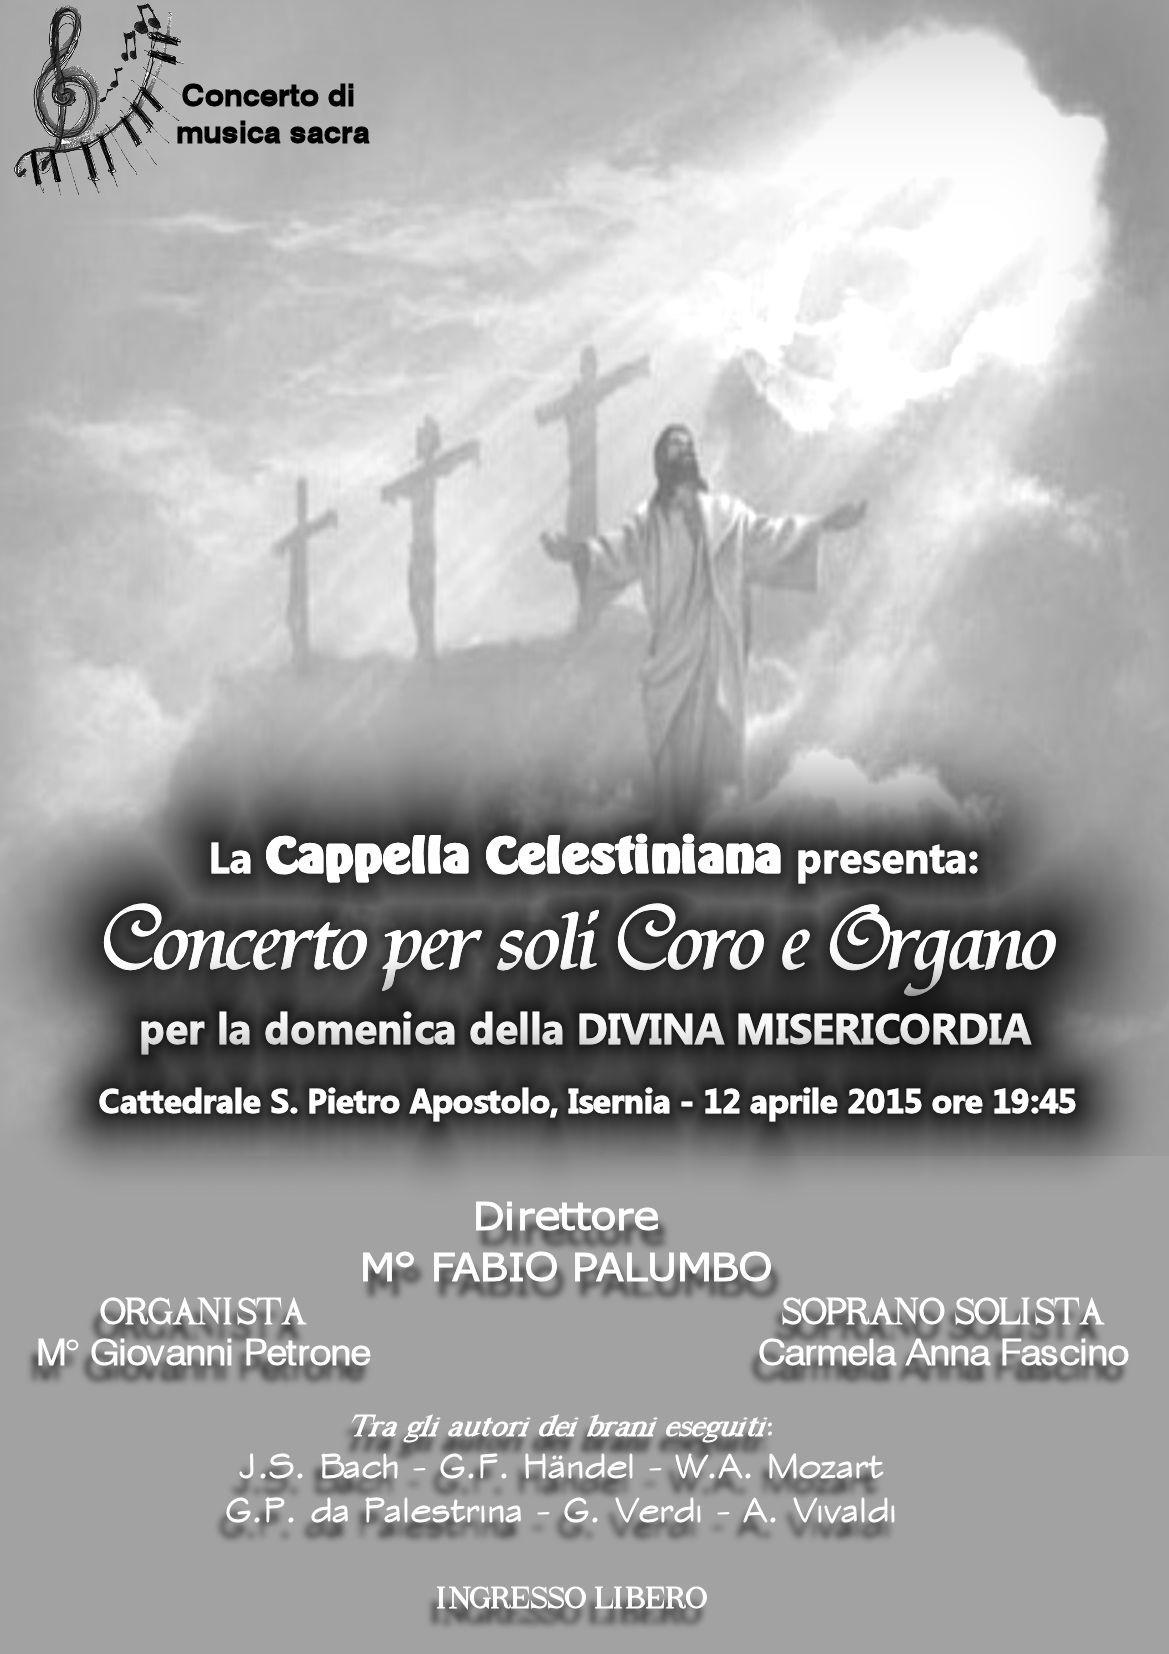 isernia cappella celestiniana